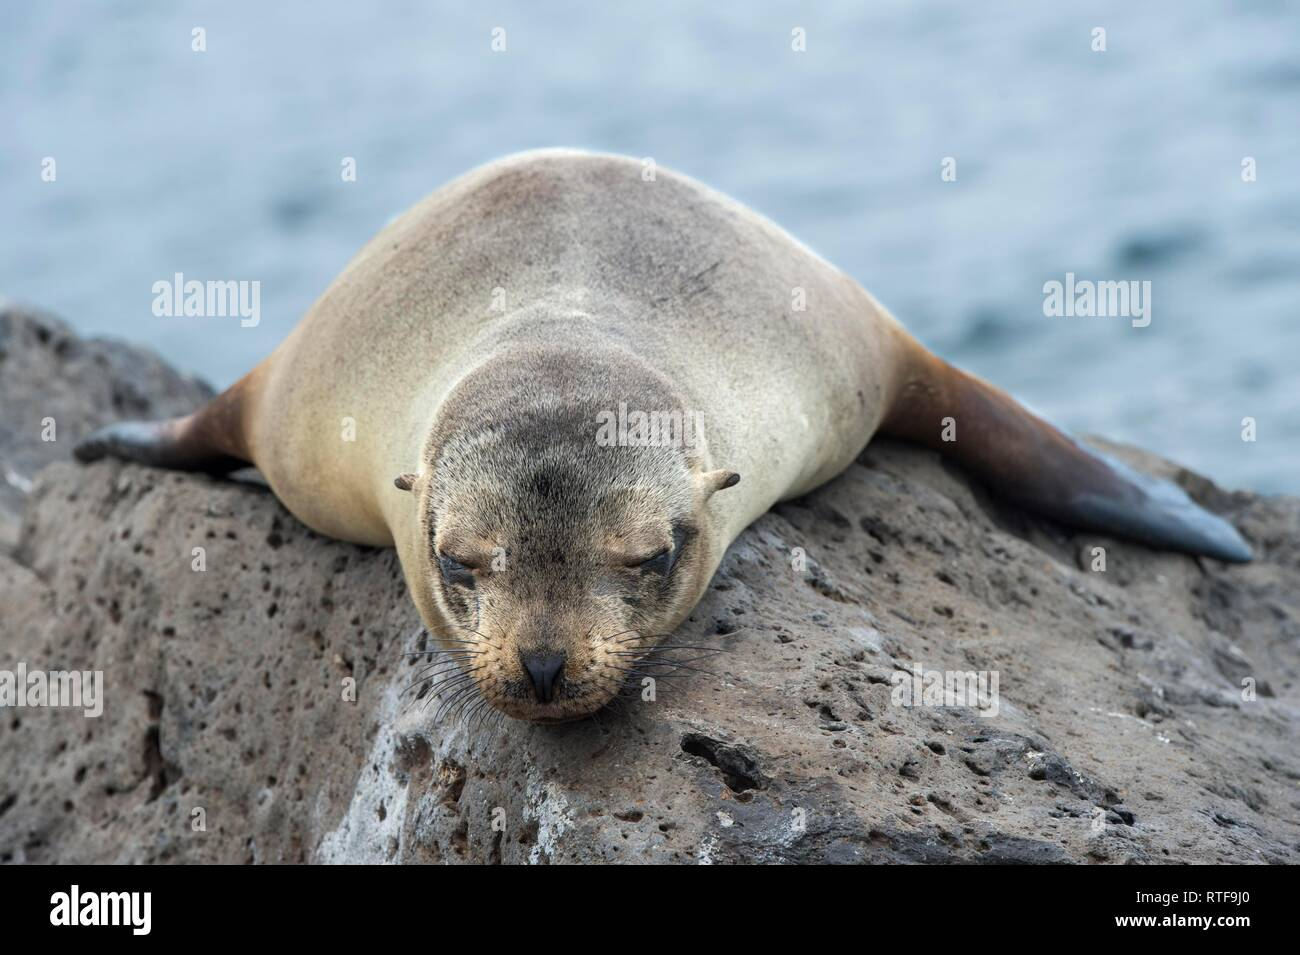 Galapagos sea lion (Zalophus wollebaeki), young animal sleeping on lava rocks, Floreana Island, Galapagos Islands, Ecuador - Stock Image